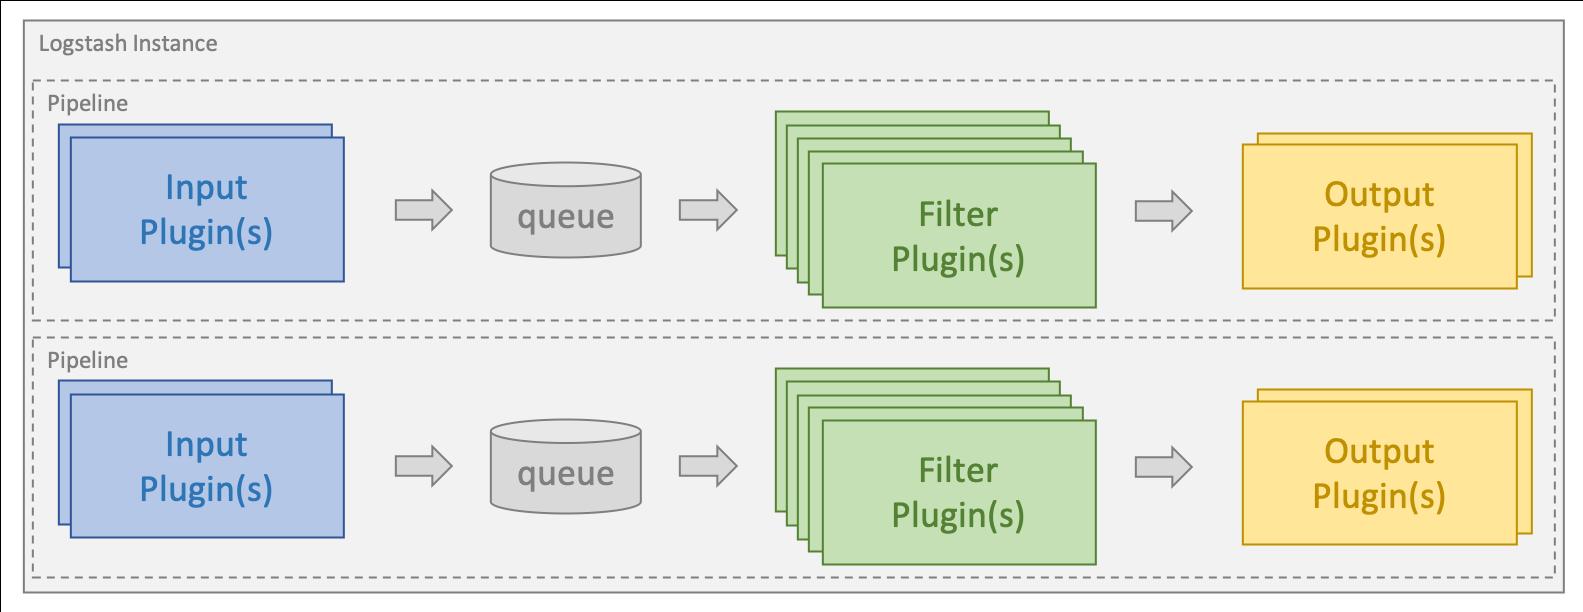 logstash-instance-input-filter-output-plugins.png